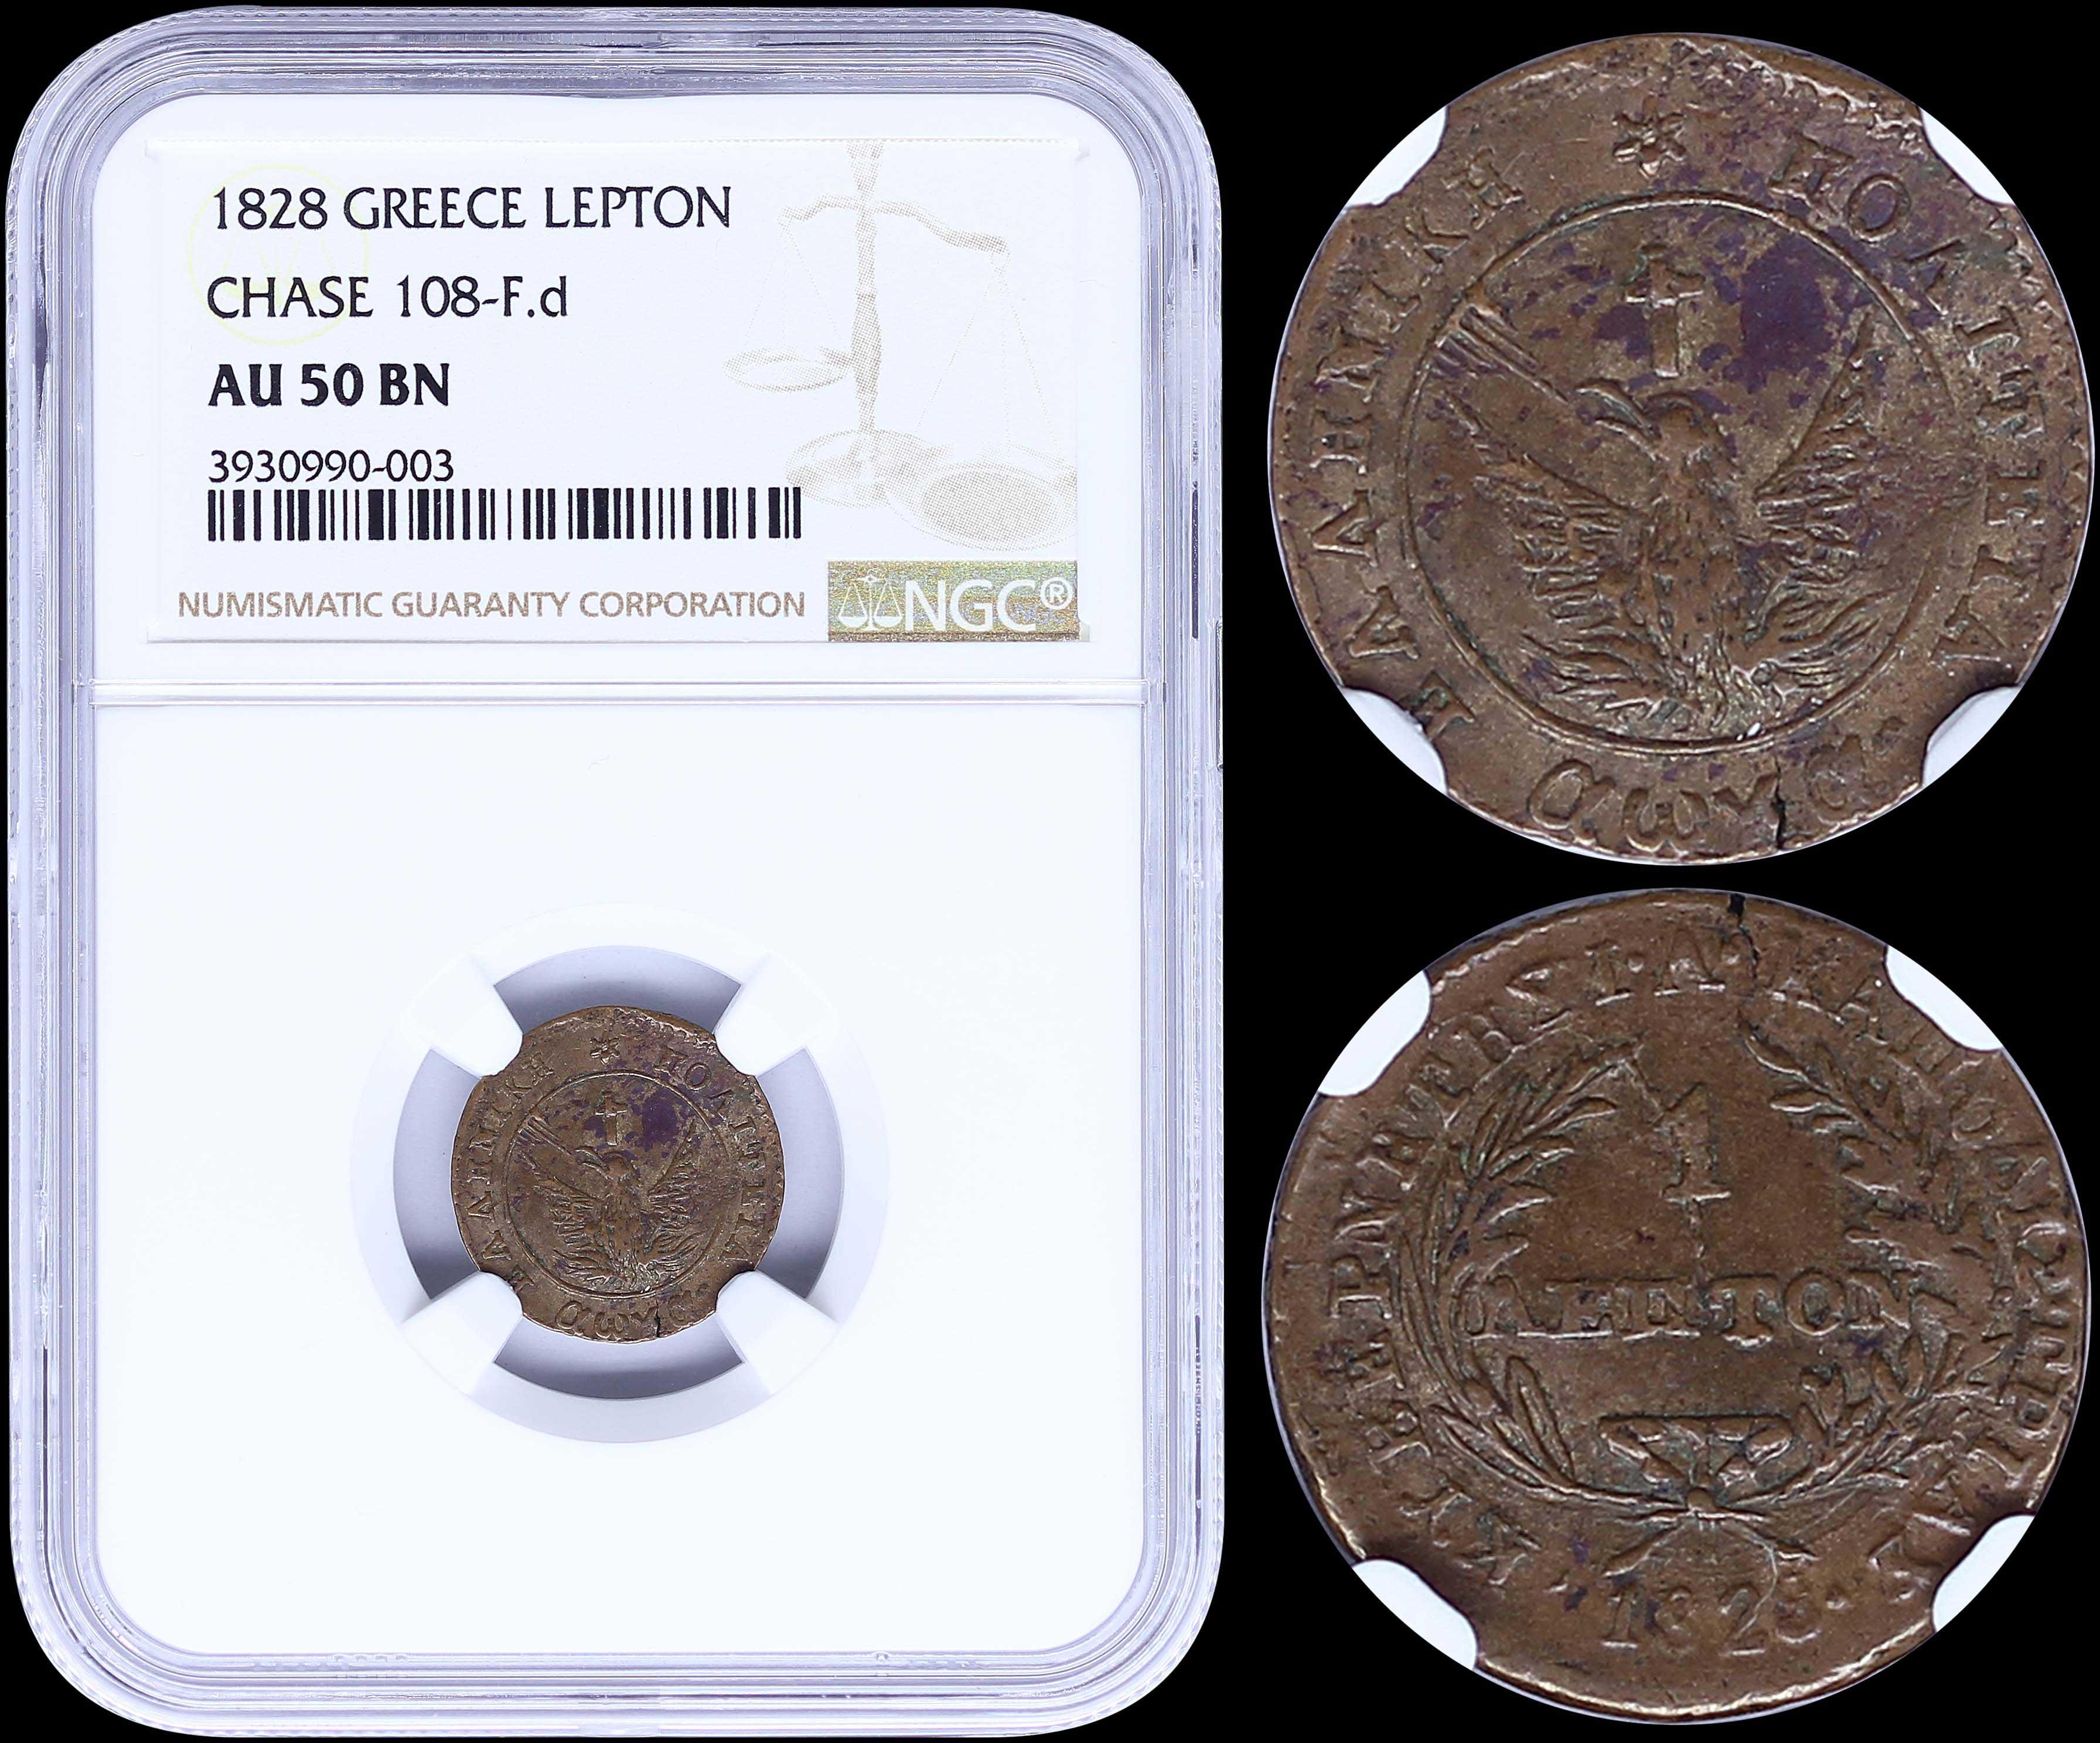 Lot 8005 - -  COINS & TOKENS governor capodistrias -  A. Karamitsos Public & Live Bid Auction 644 Coins, Medals & Banknotes